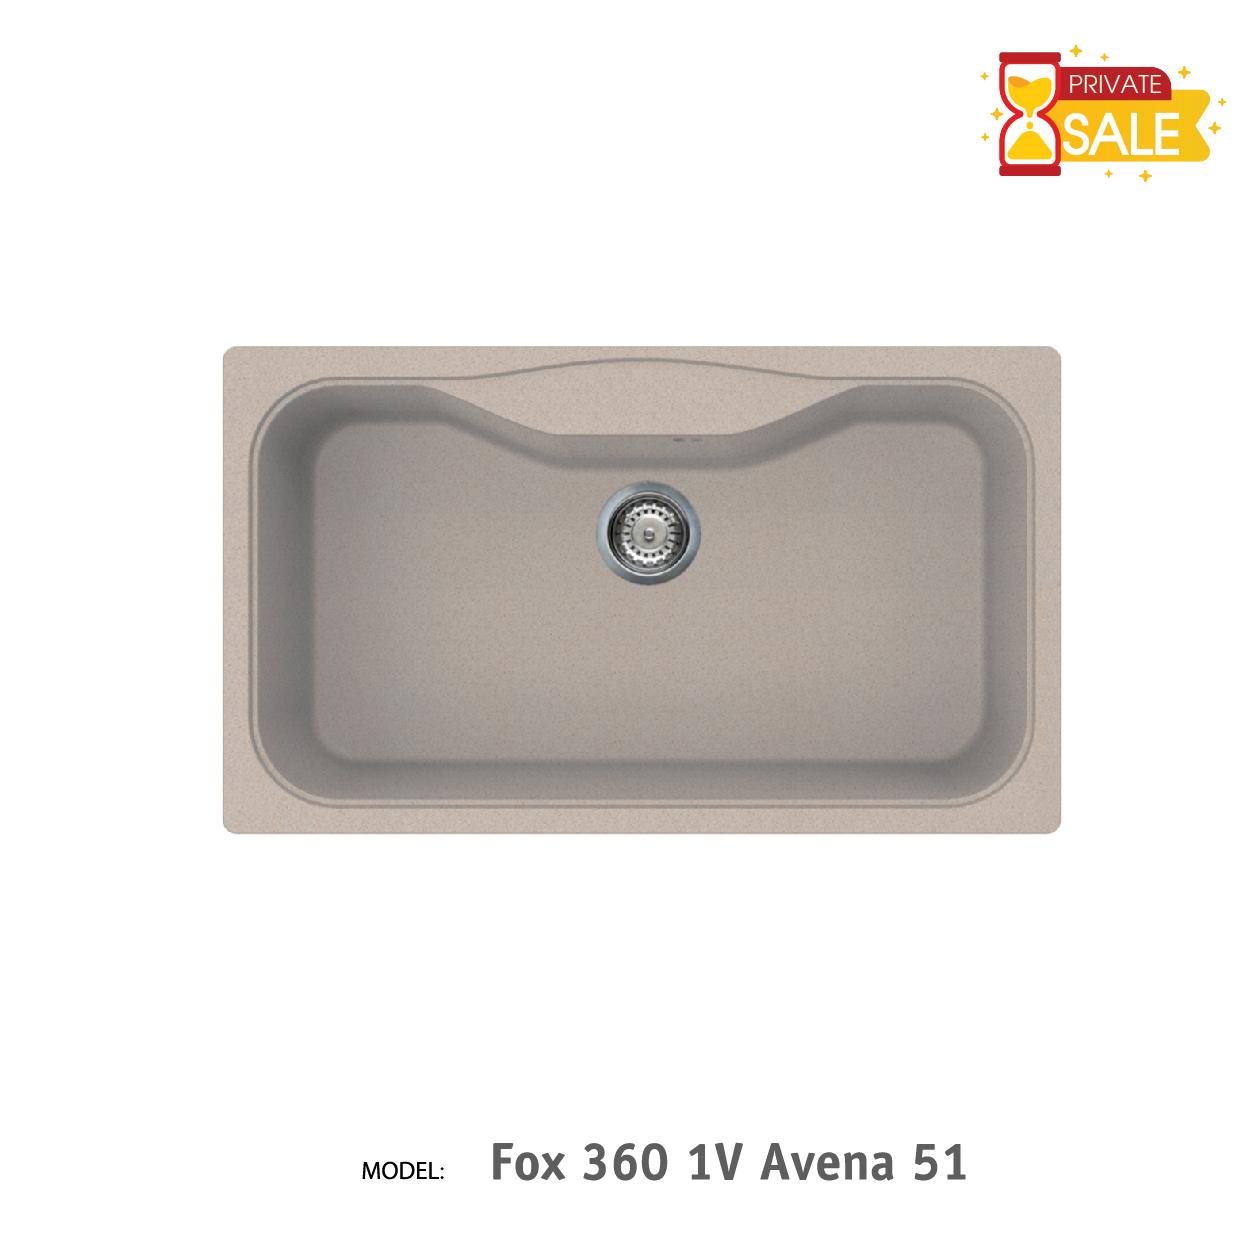 Chậu đá Elleci - Model Fox 3601V Avena51